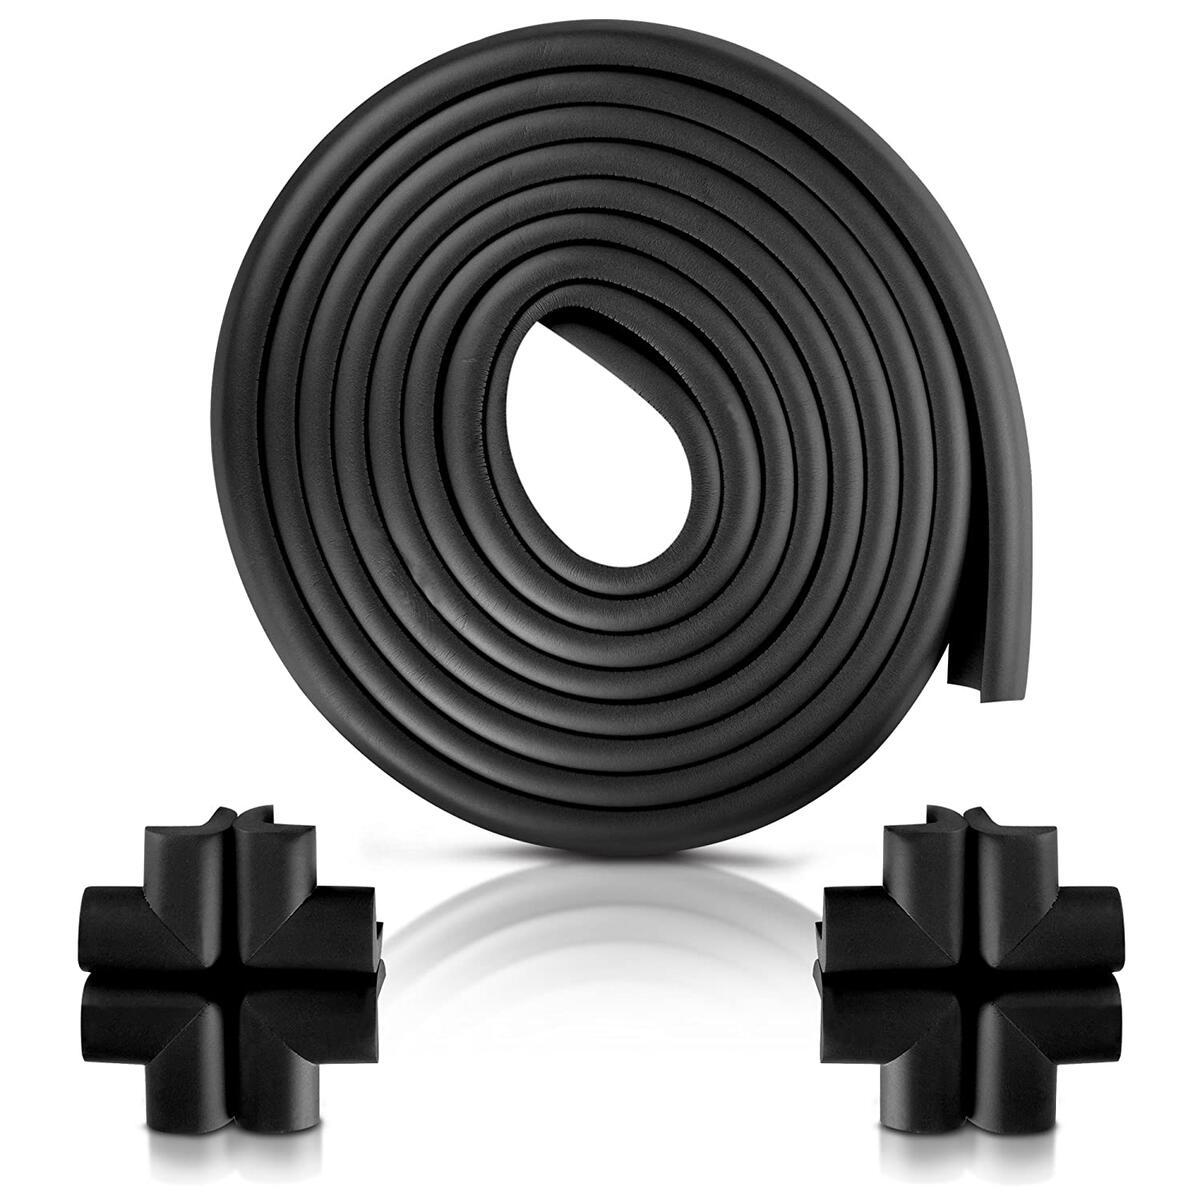 Furniture Edge and Corner Guards | 20.4ft Protective Foam Cushion | 18ft Bumper 8 Adhesive Childsafe Corners